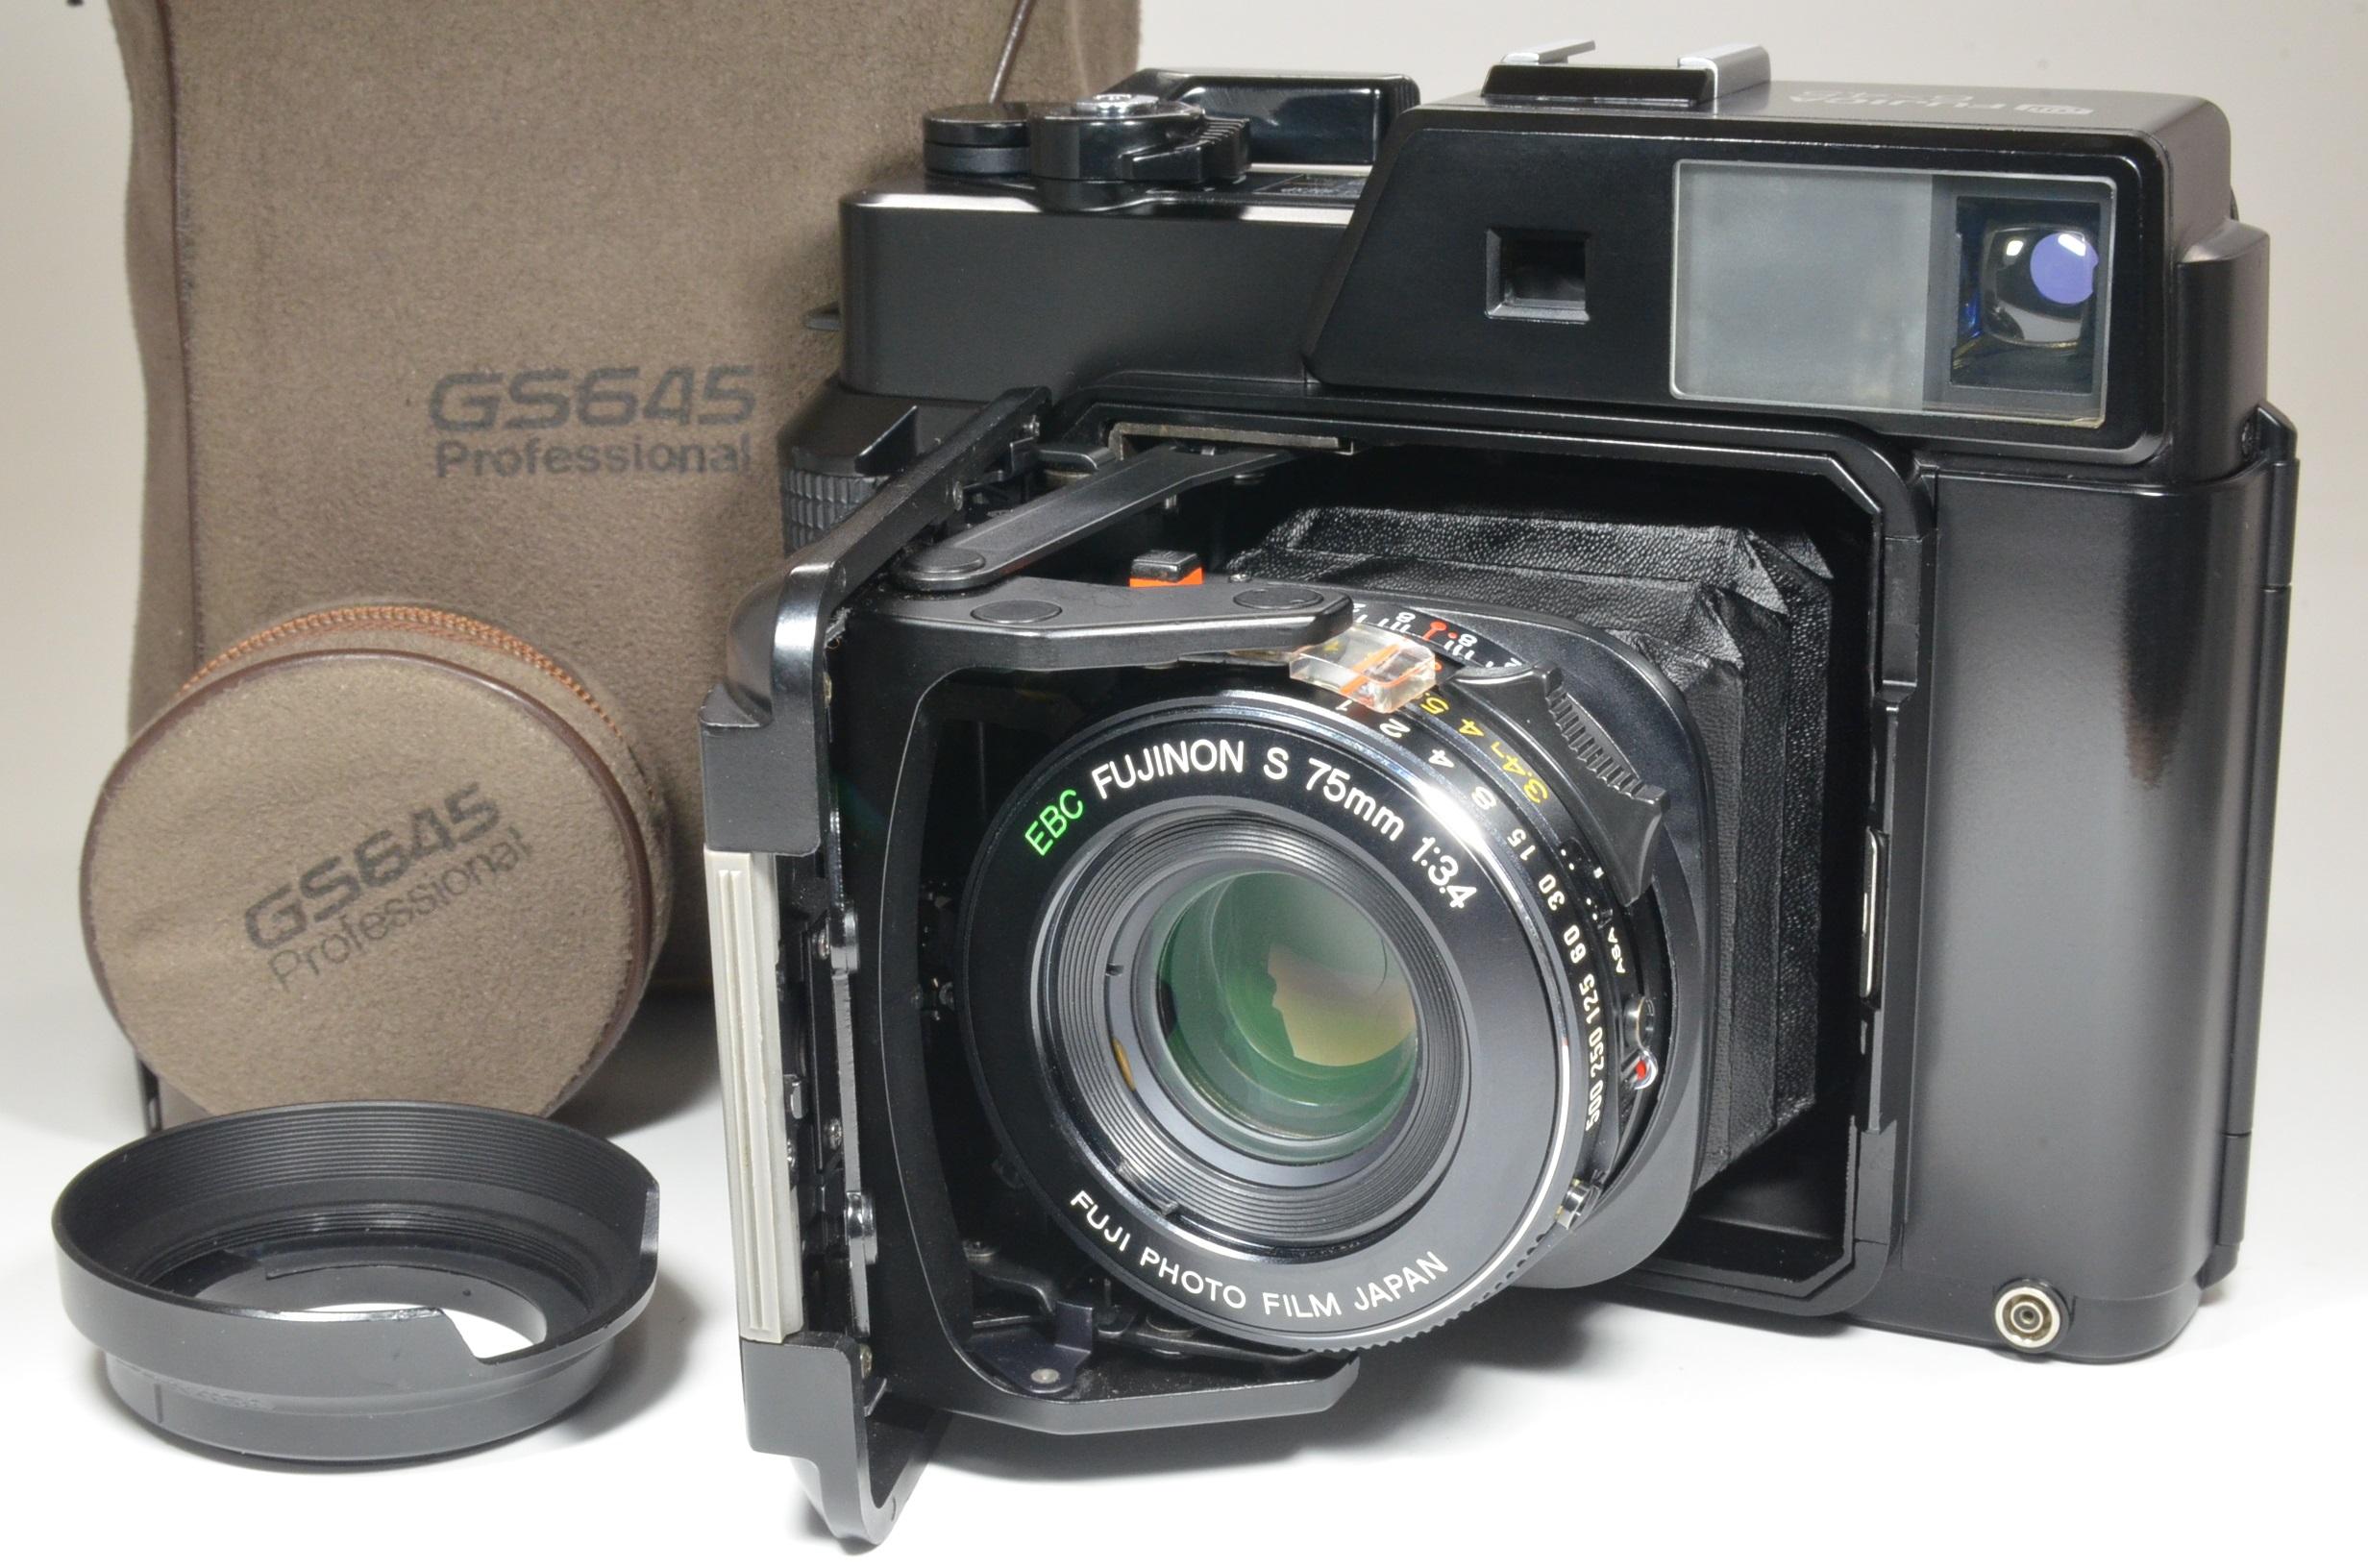 fujifilm fujica gs645 camera 75mm f3.4 with lens hood